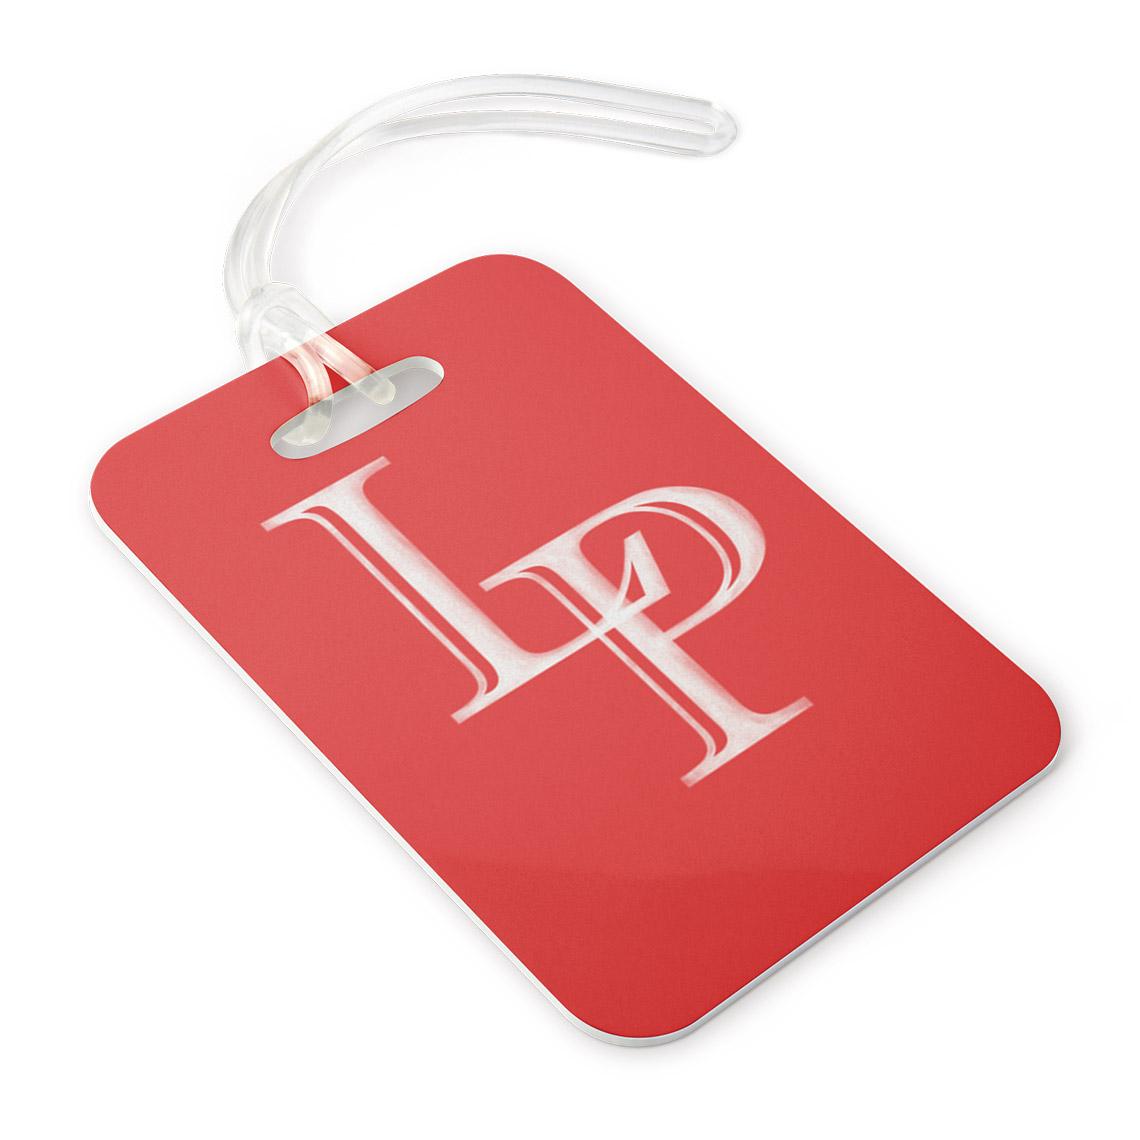 Custom Luggage Tag | Luggage Tag | Home Gift | Gifts | Snapfish US